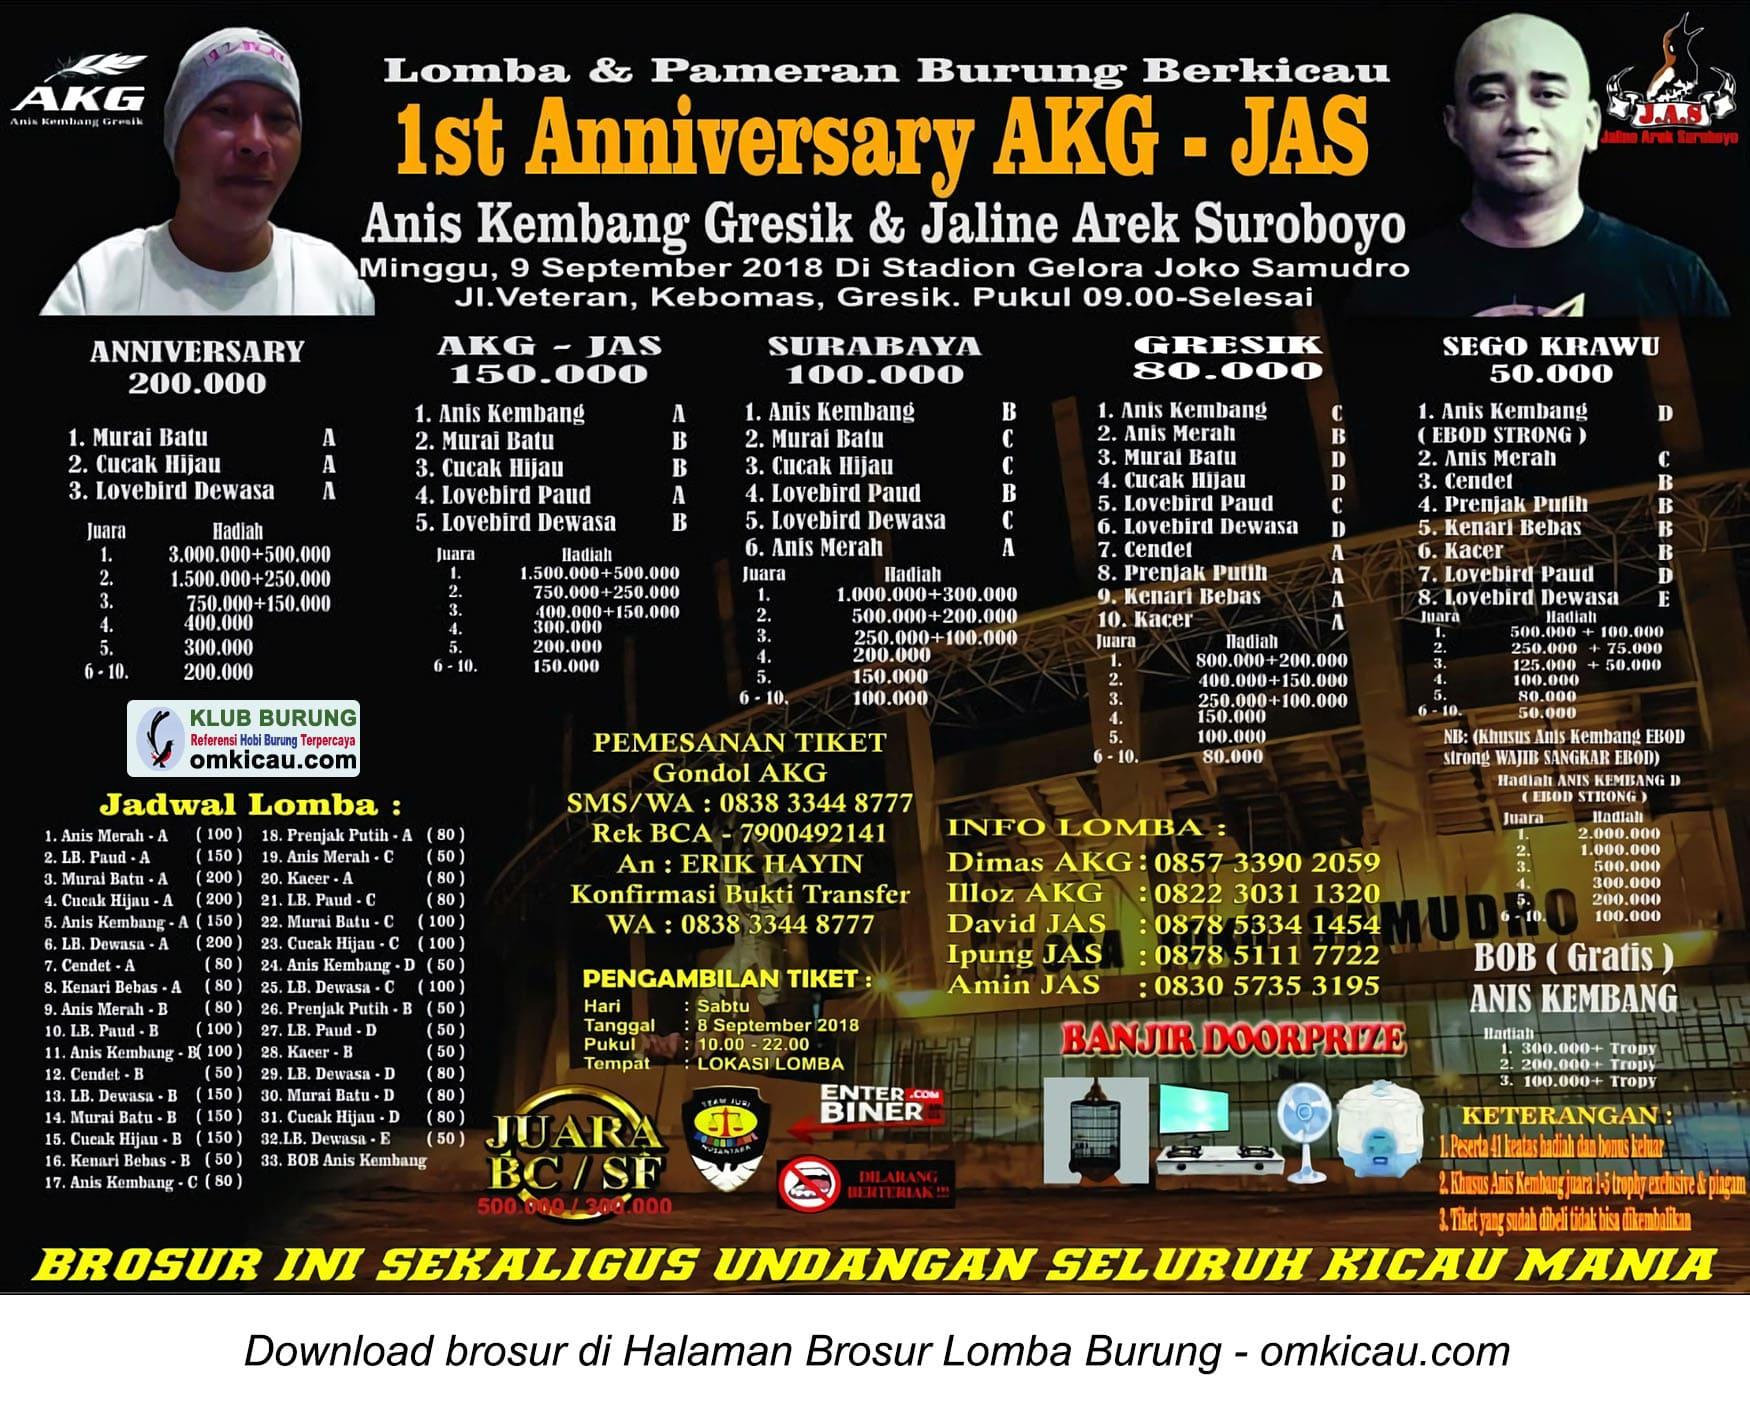 1st Anniversary AKG - JAS